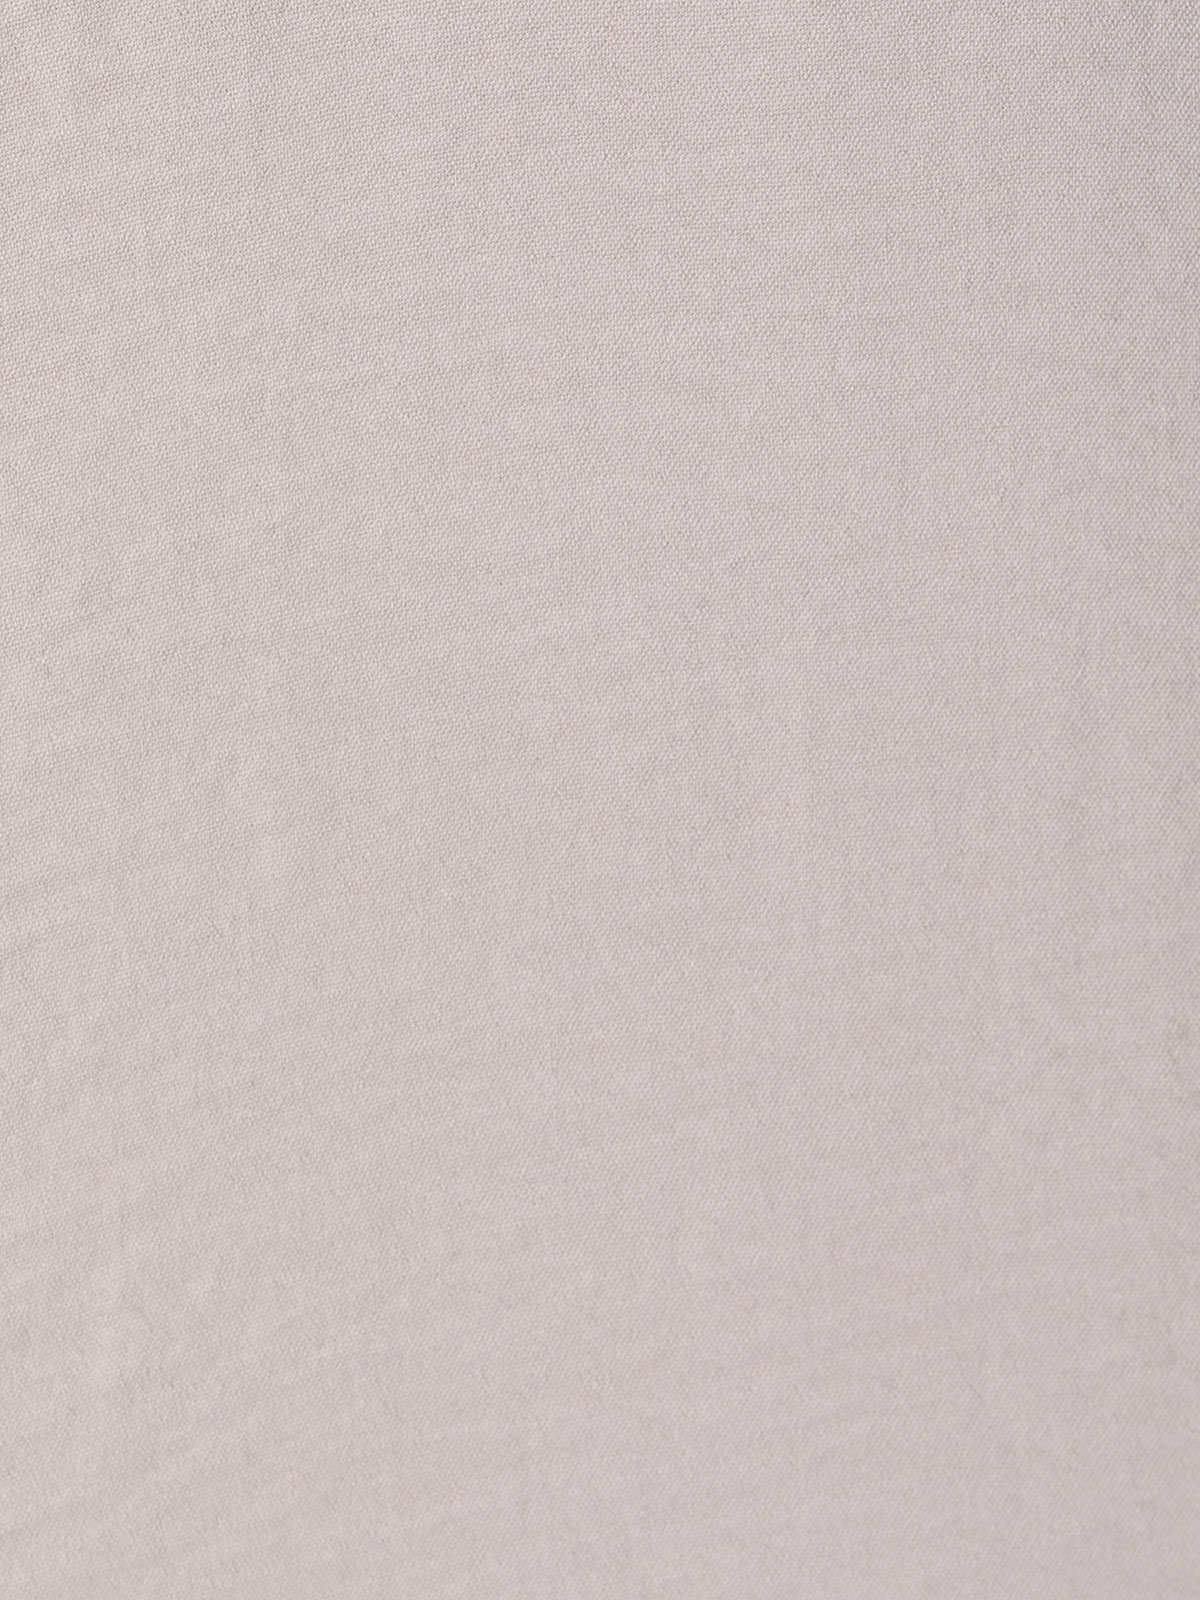 Camisa fluida mujer detalle cordón Beige